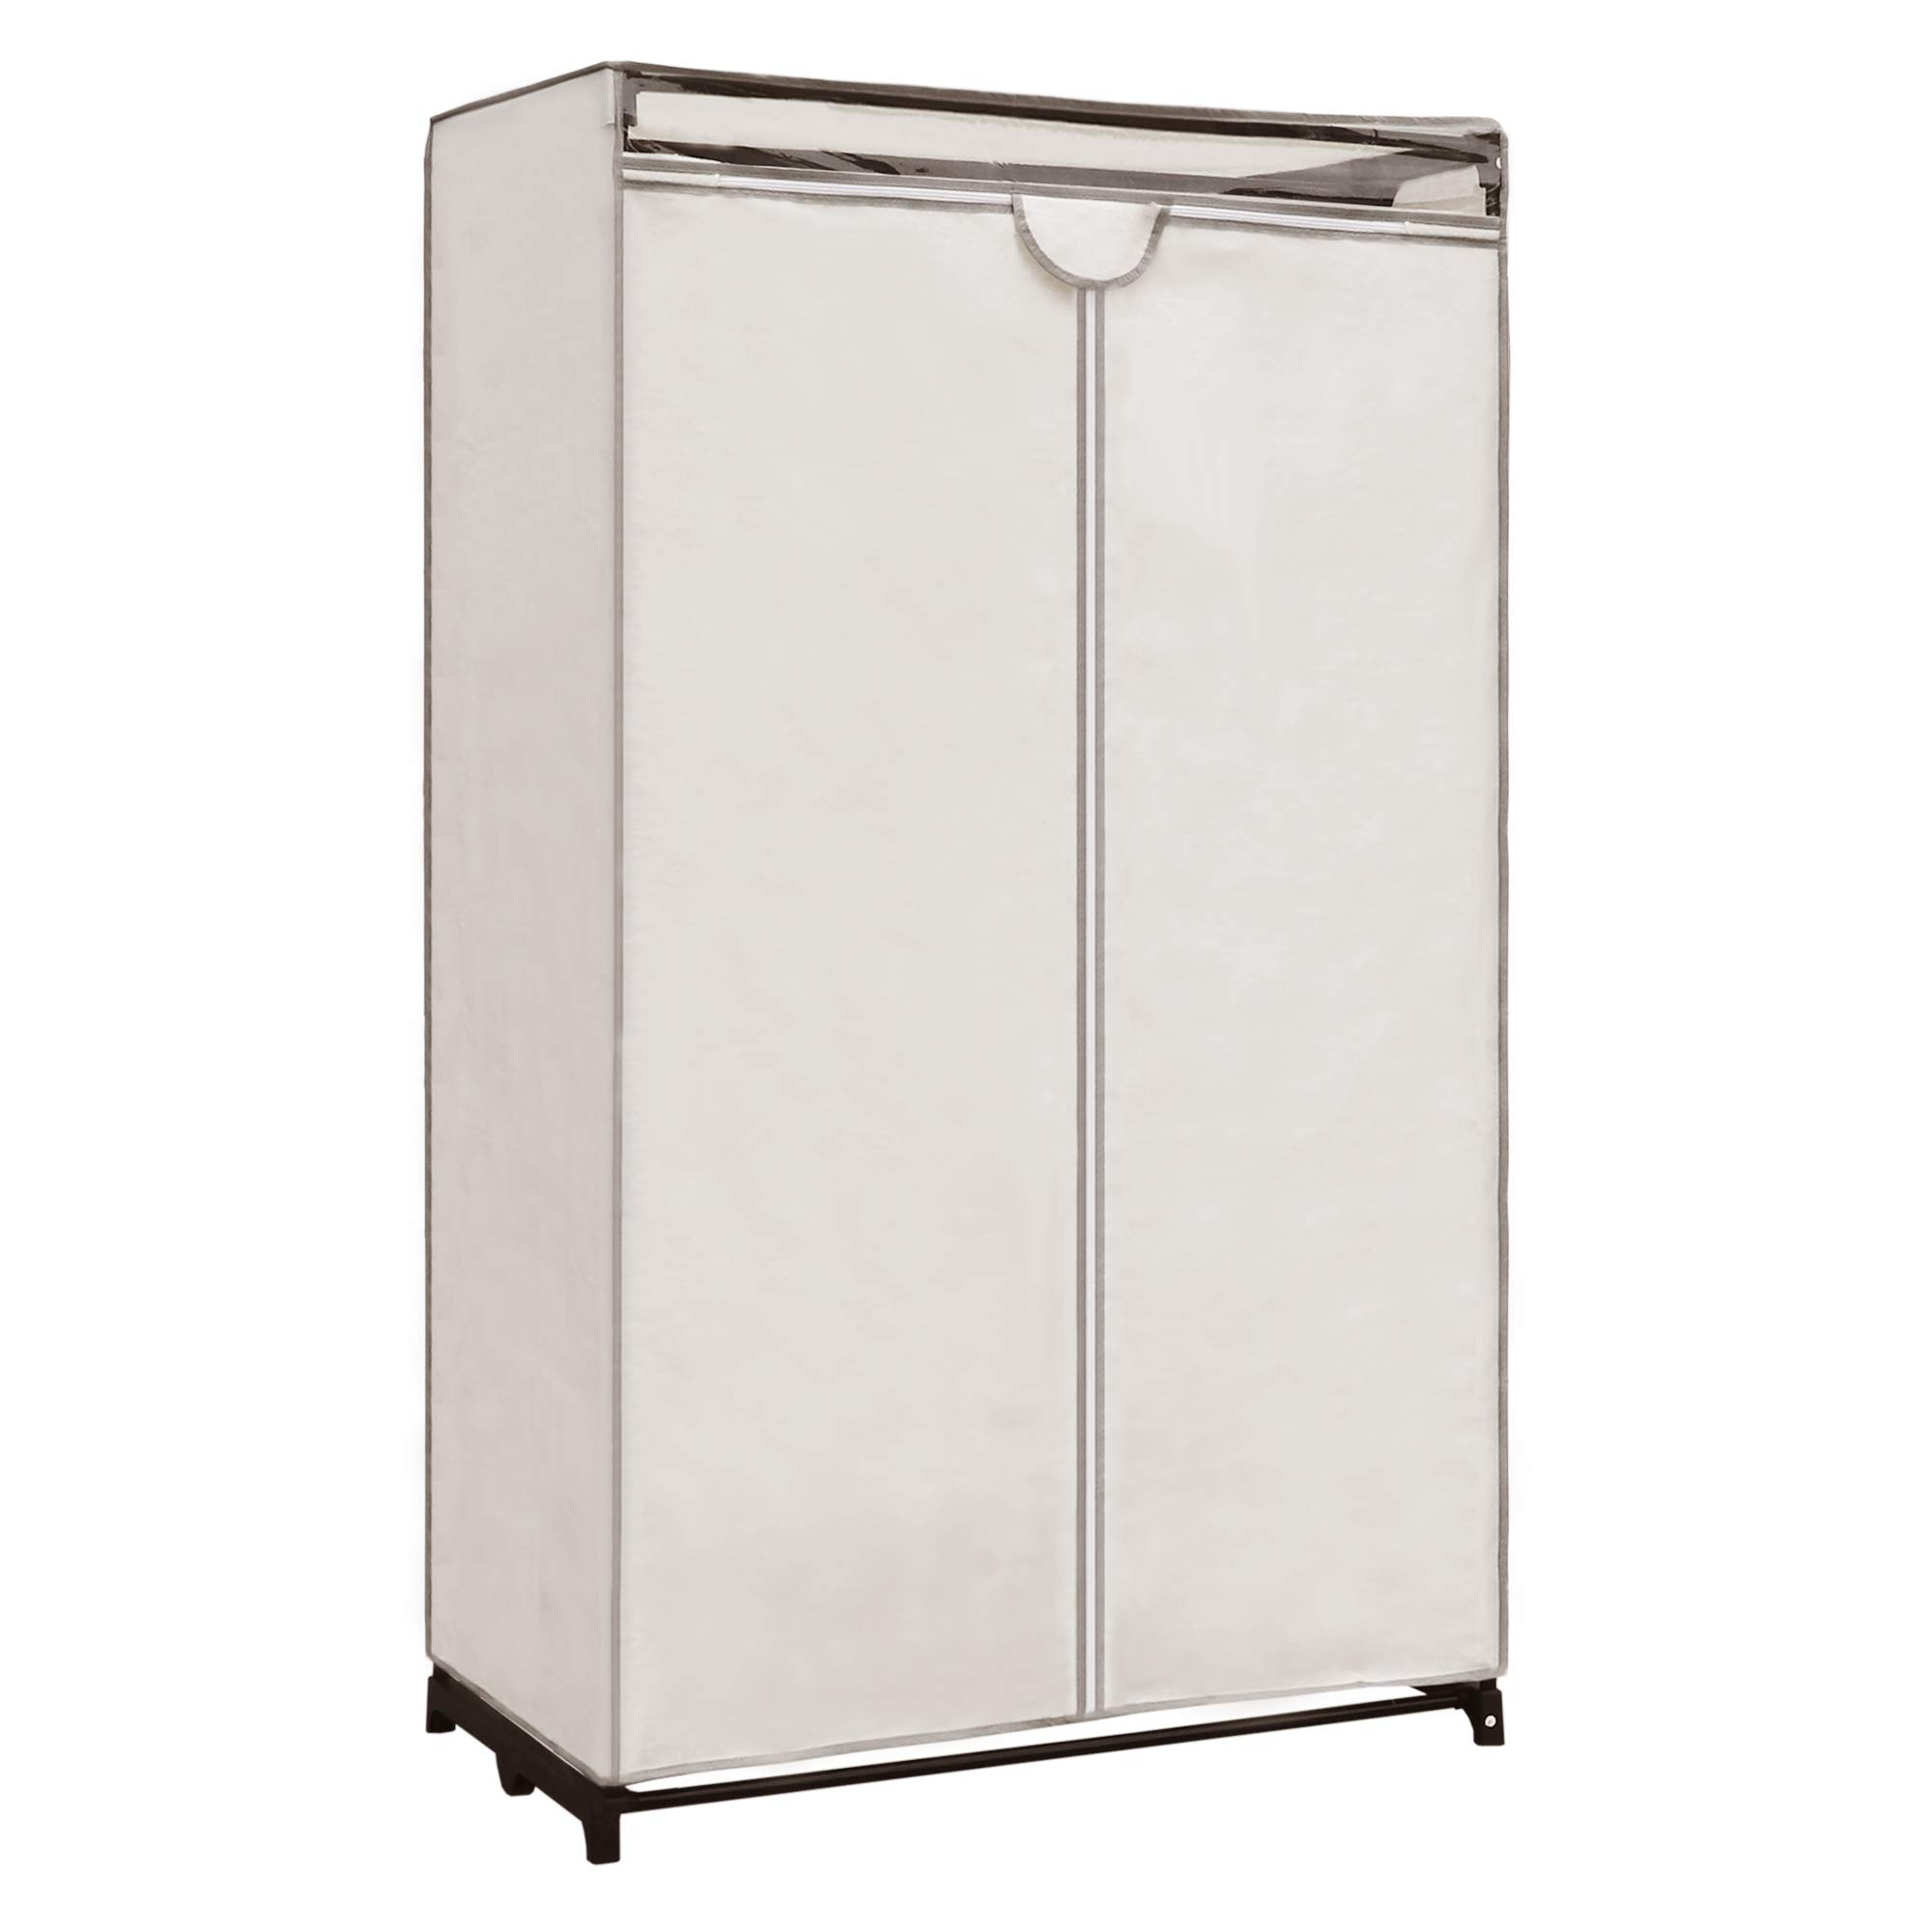 ABBLE Wardrobe Portable Organizer Material